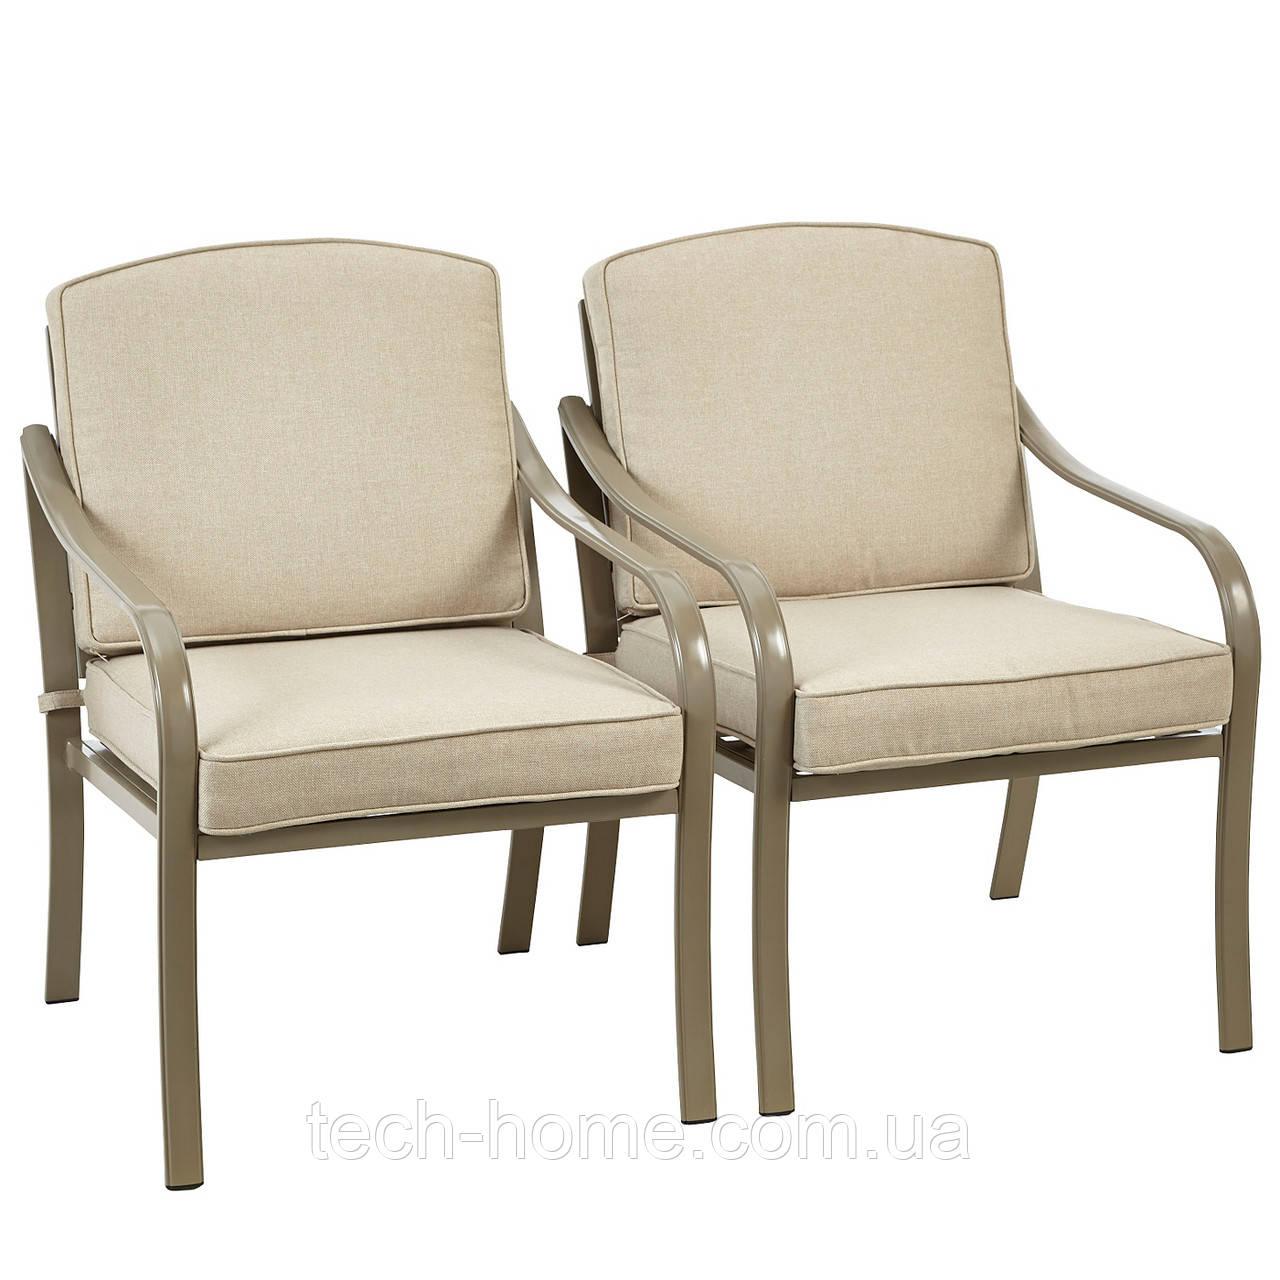 Набор садовых стульев, George Home 2 Haversham Classic Dining Chairs Linen